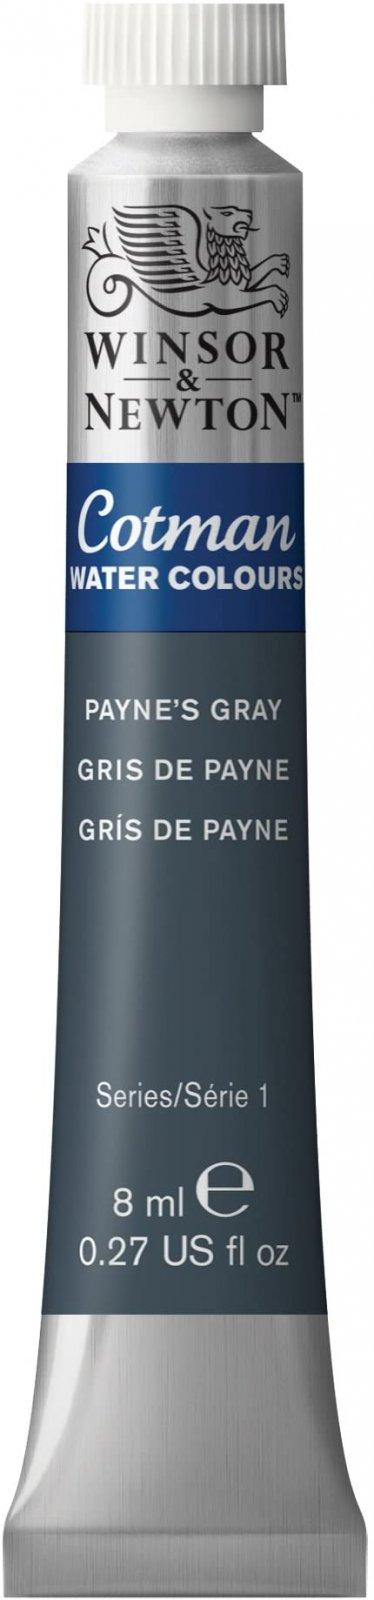 Winsor & Newton Cotman Water Colours 8ml-Paynes Gray